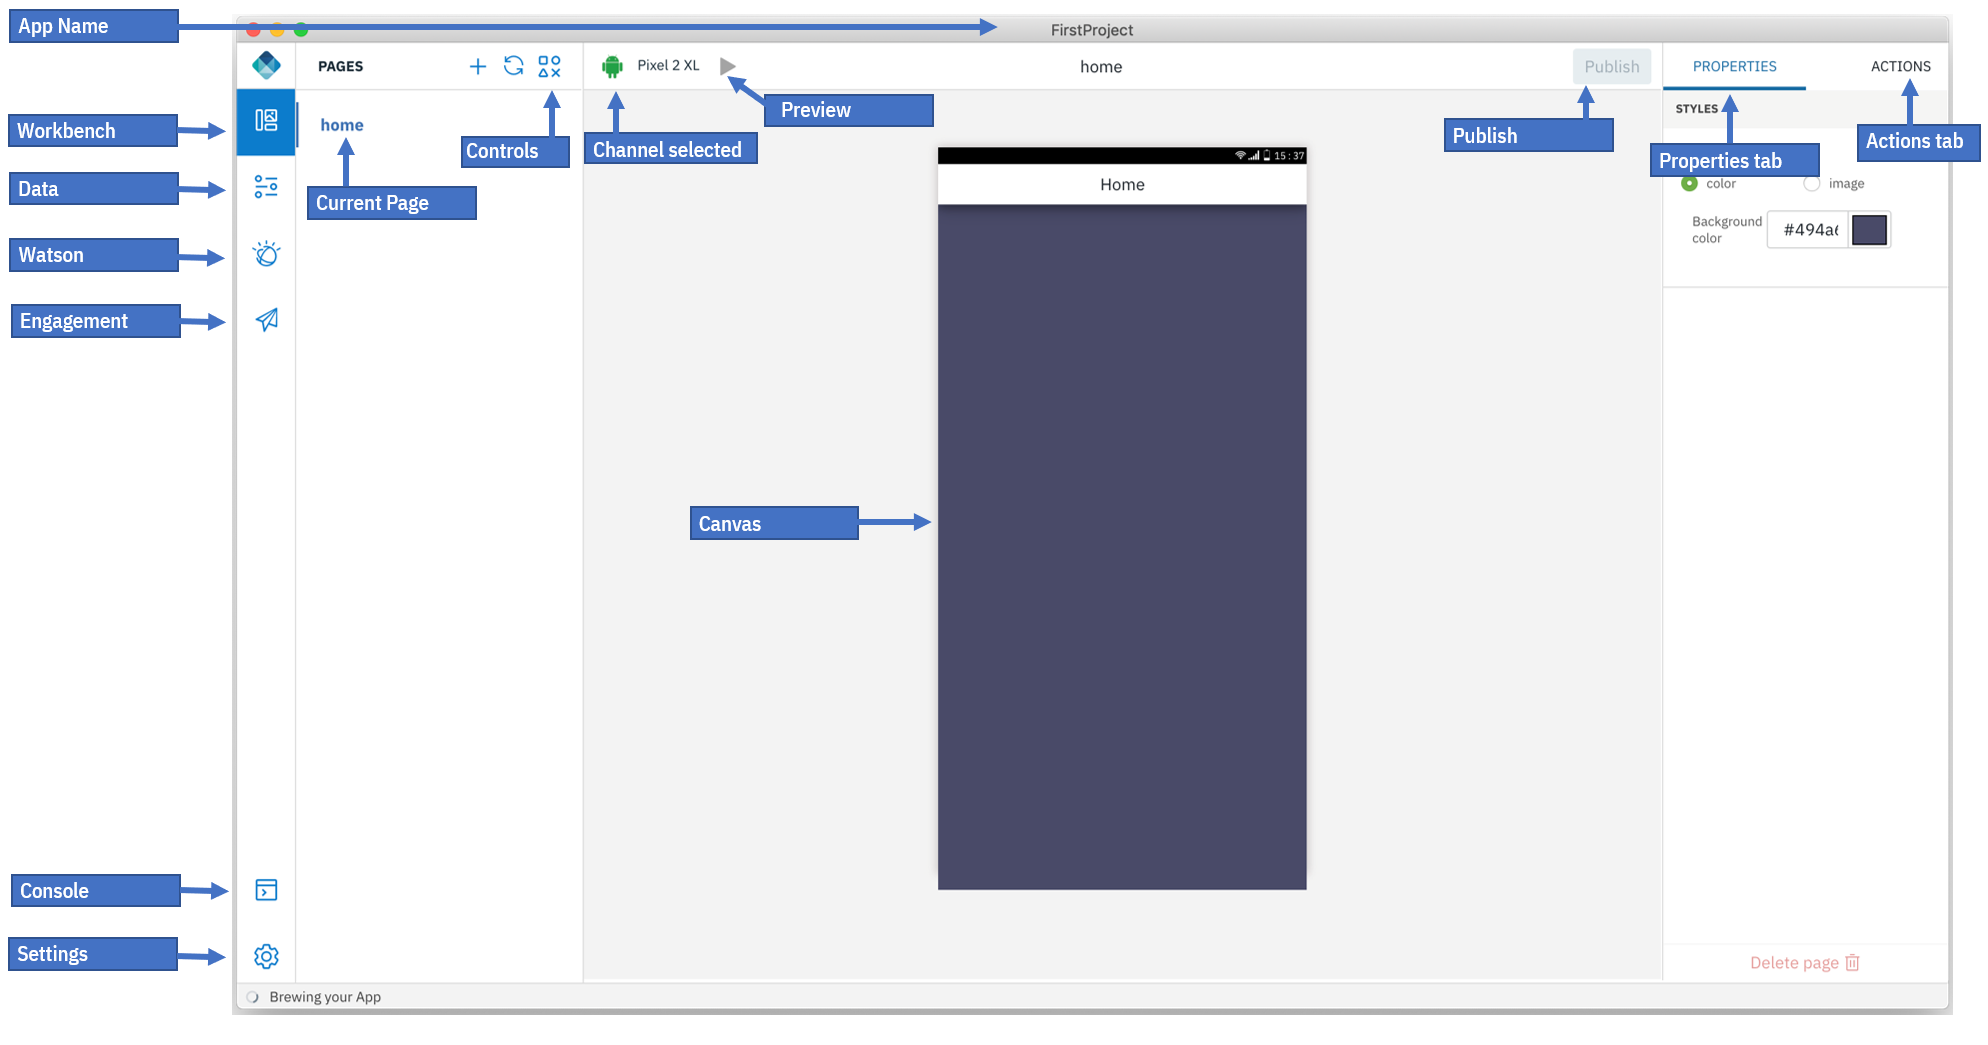 Digital App Builder interface - IBM Mobile Foundation Developer Center